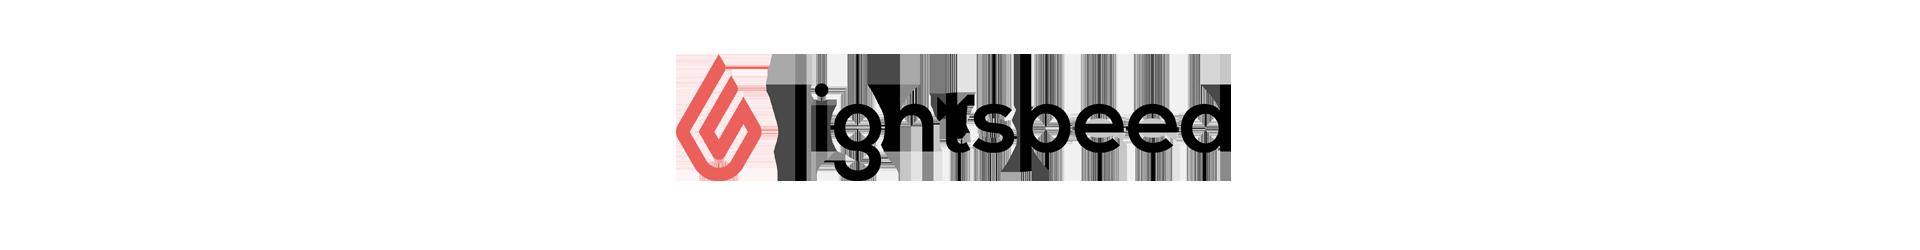 Partnership #Lightspeed Acquisition